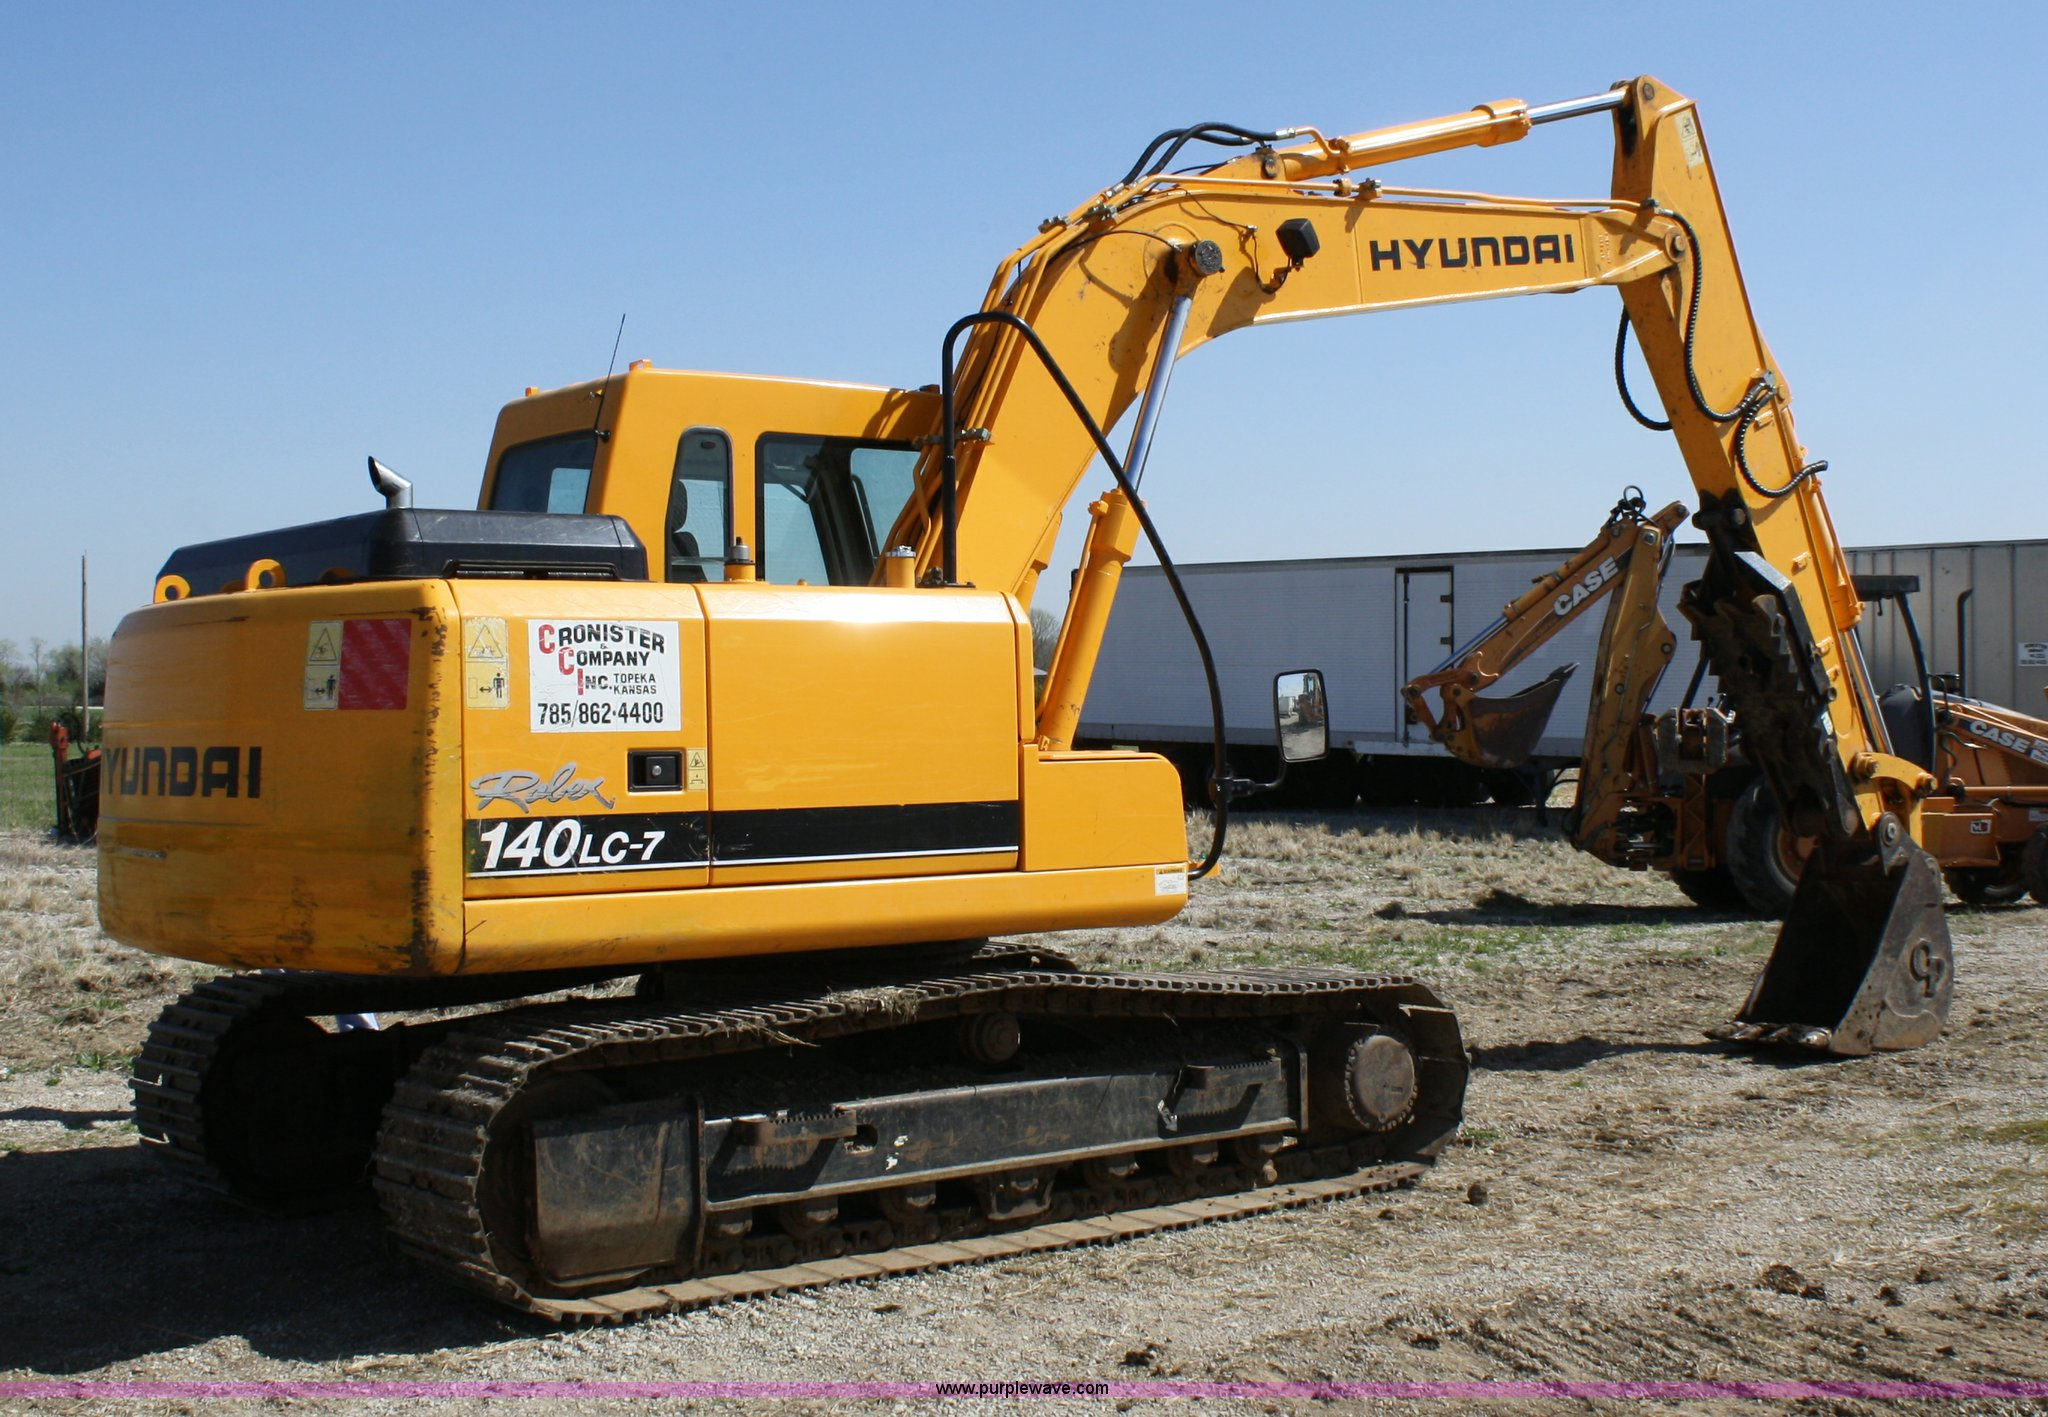 ... Hyundai 140 LC7 excavator Full size in new window ...